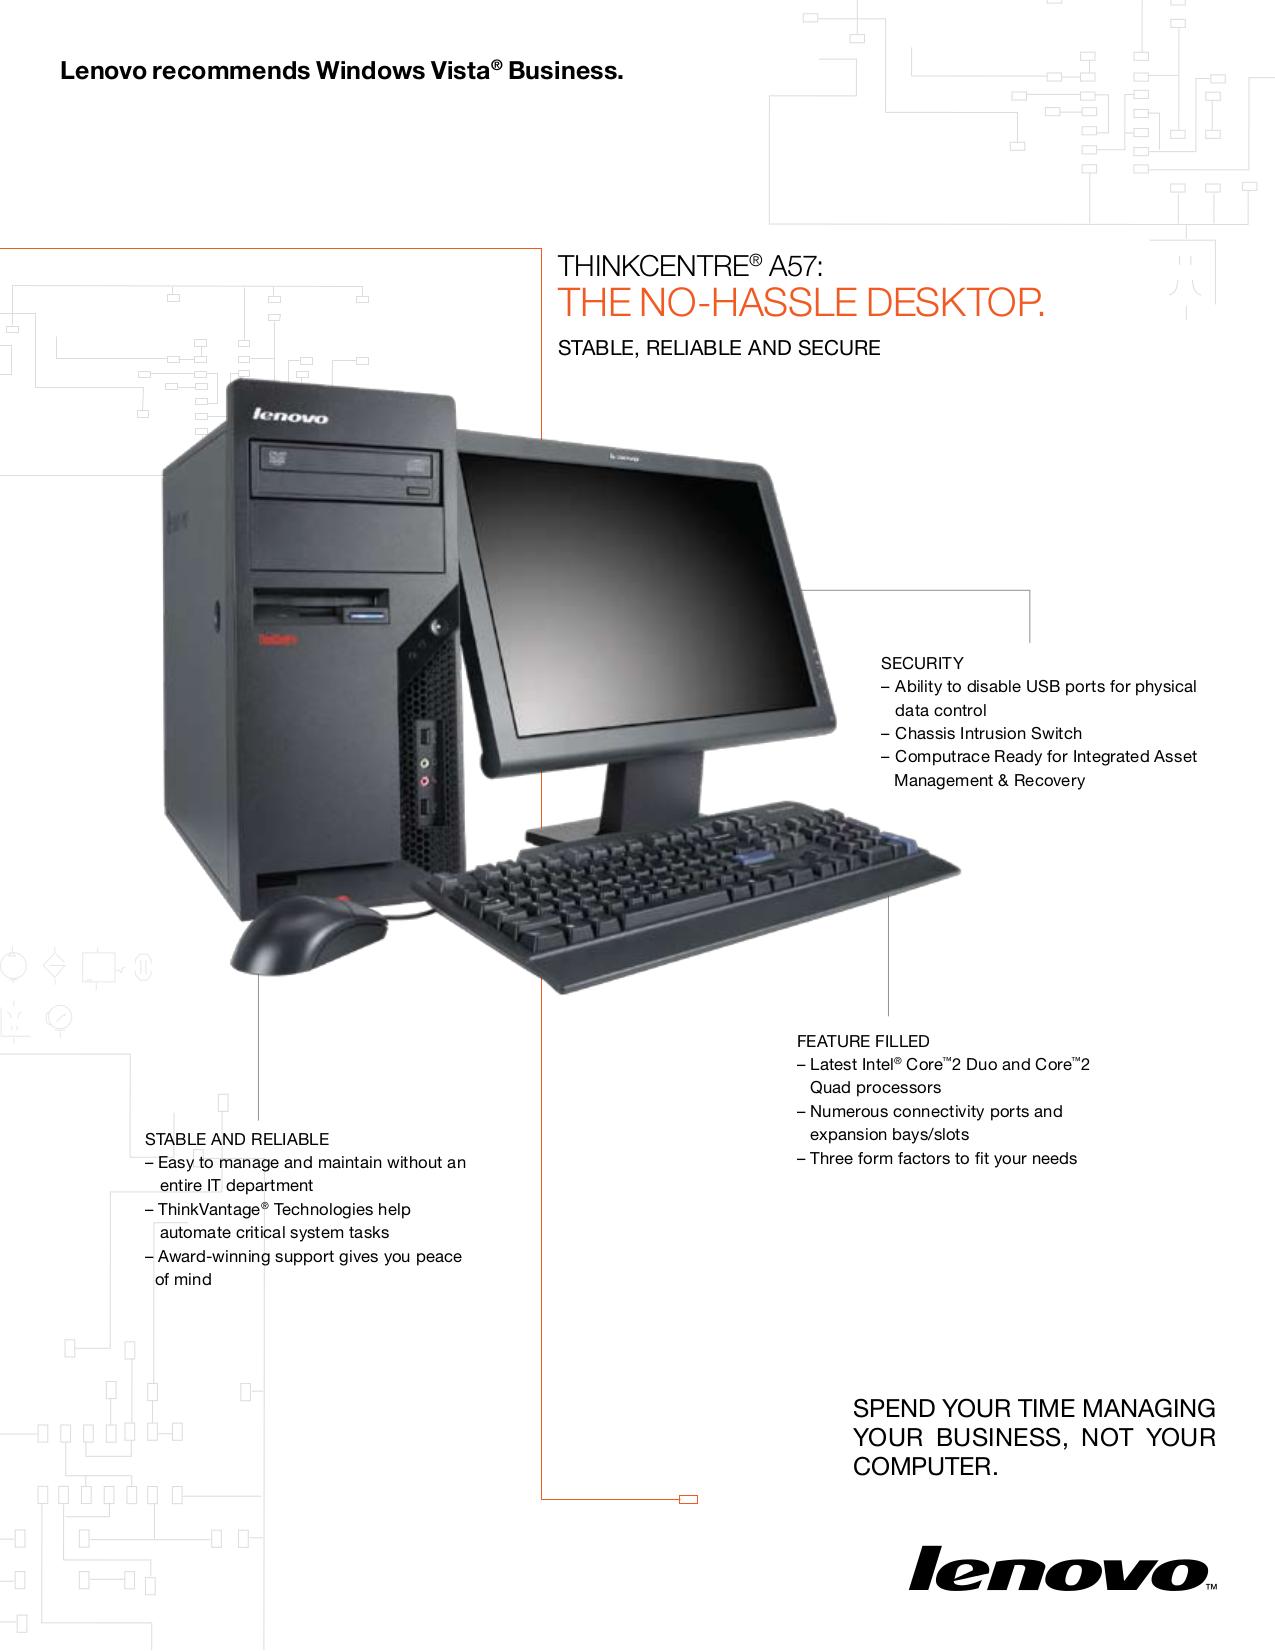 pdf for Lenovo Desktop ThinkCentre A57 9794 manual